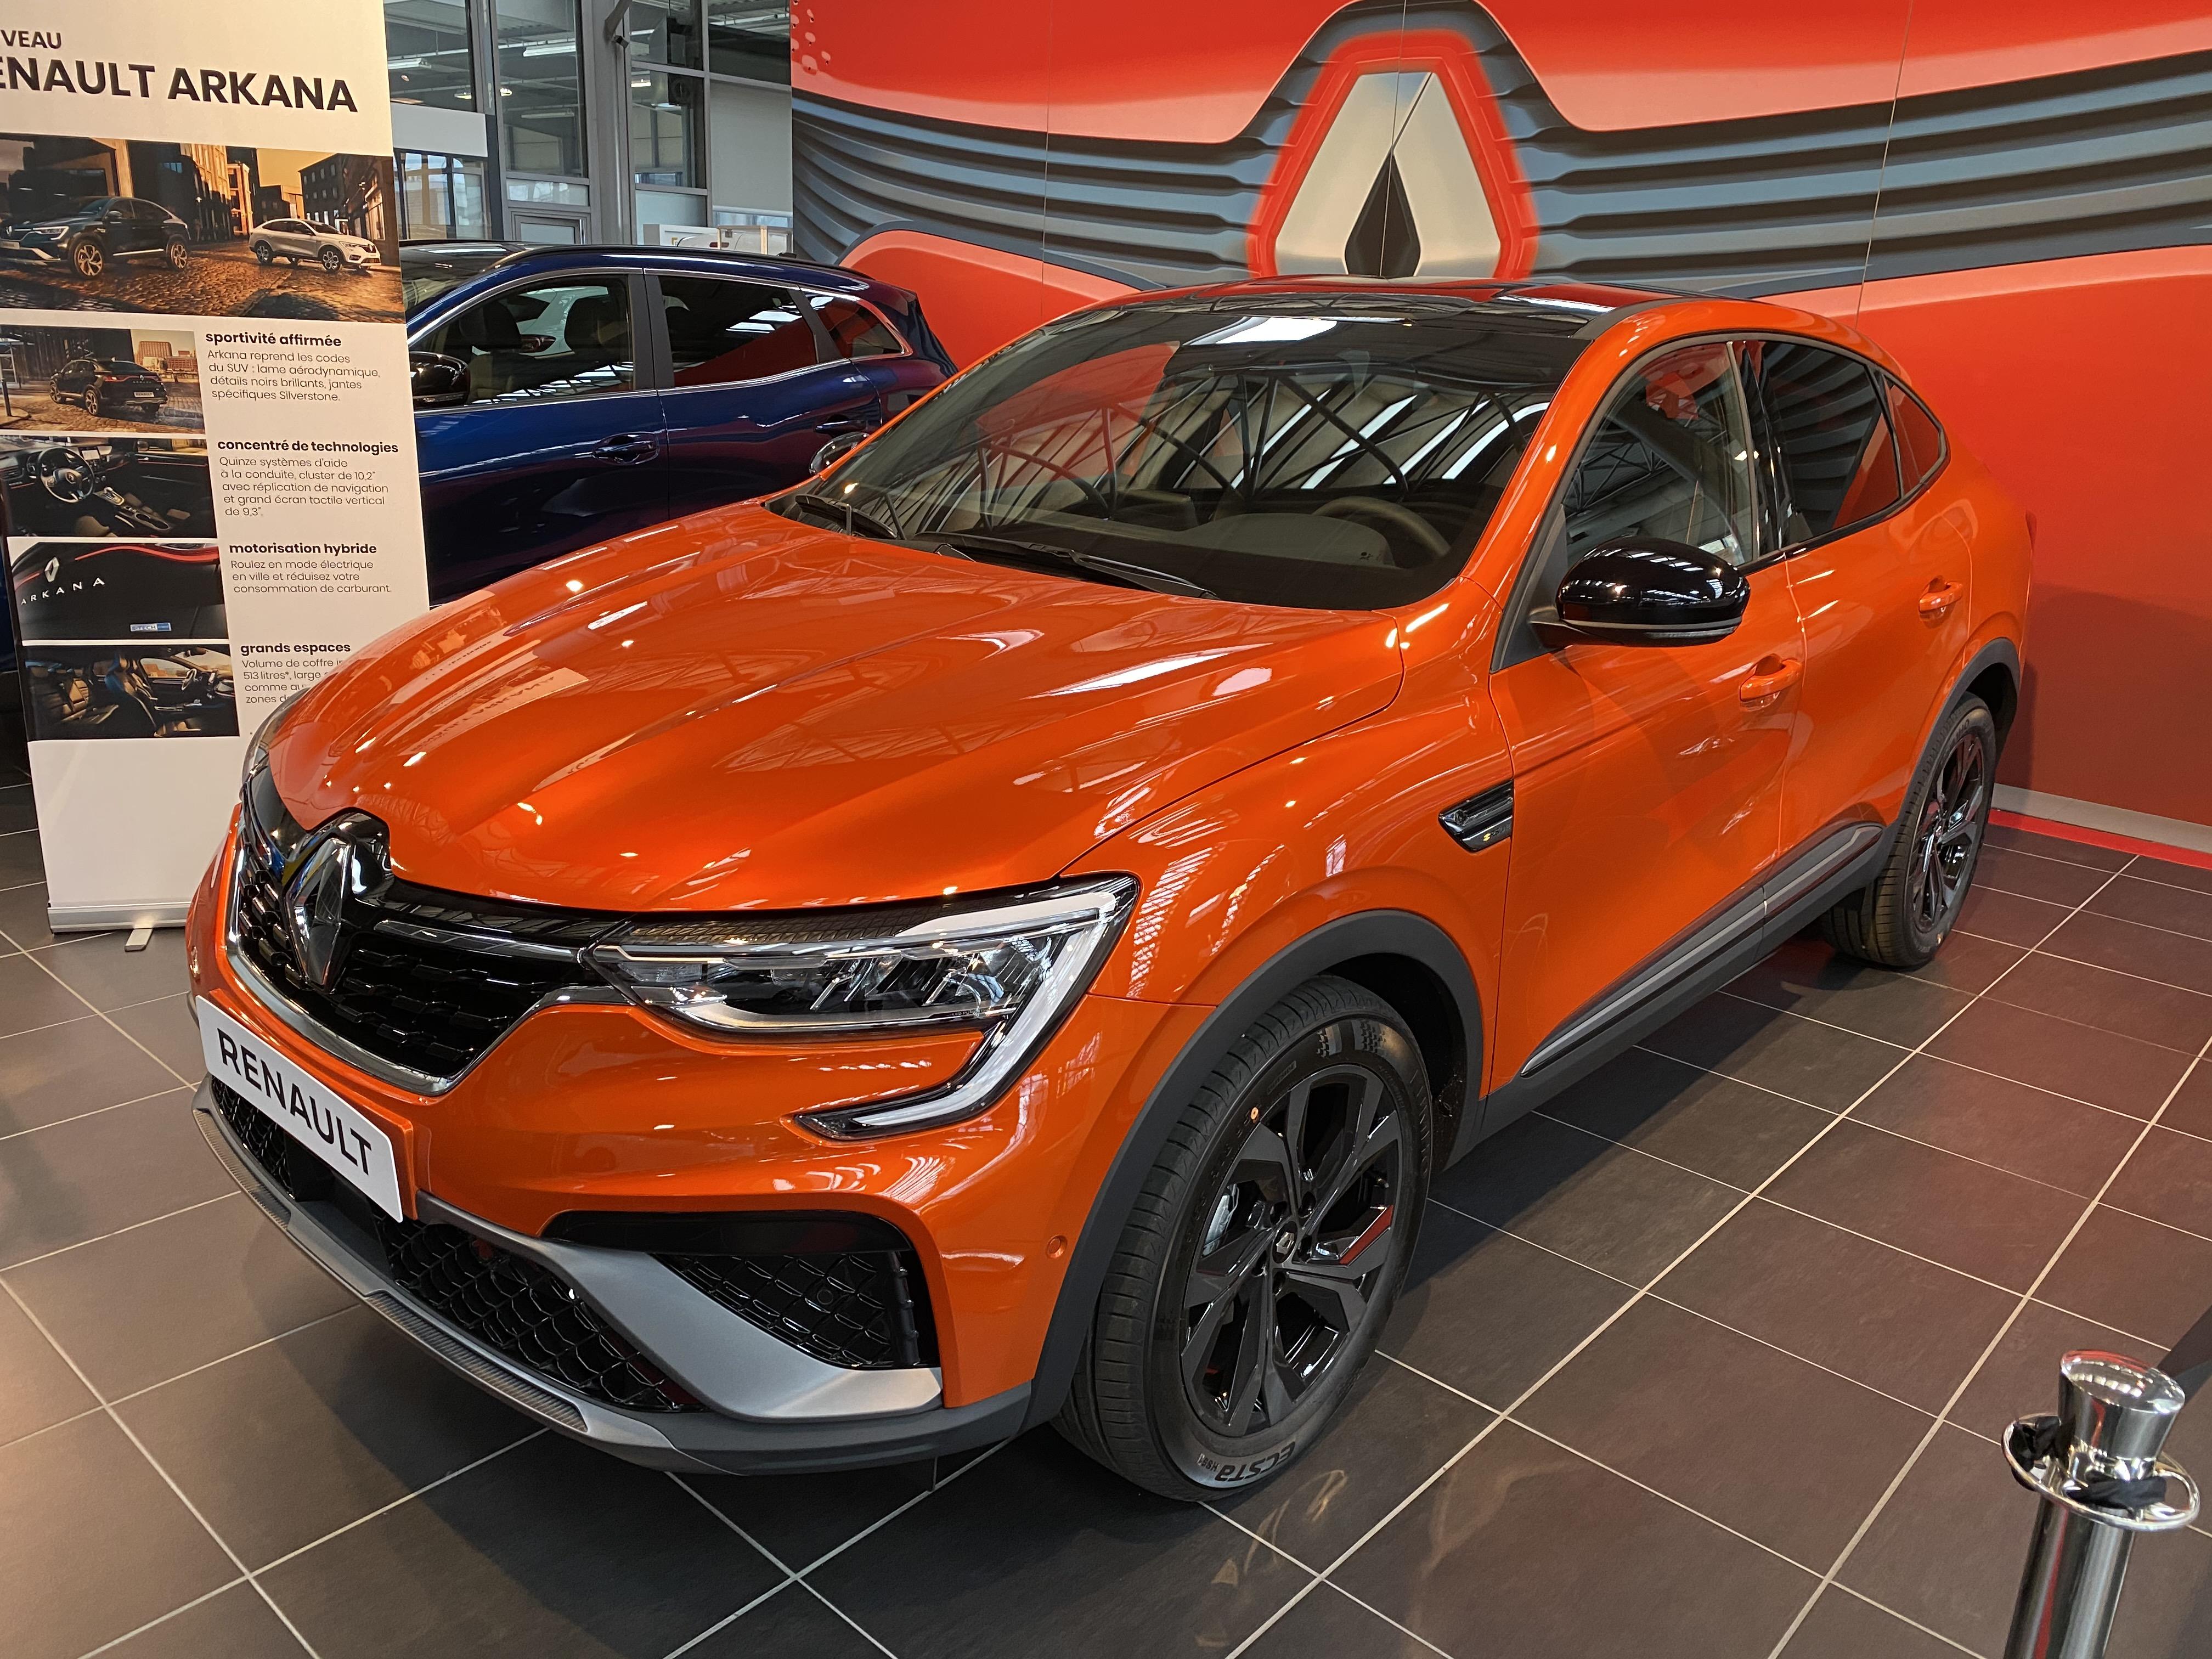 Nouveau Renault ARKANA